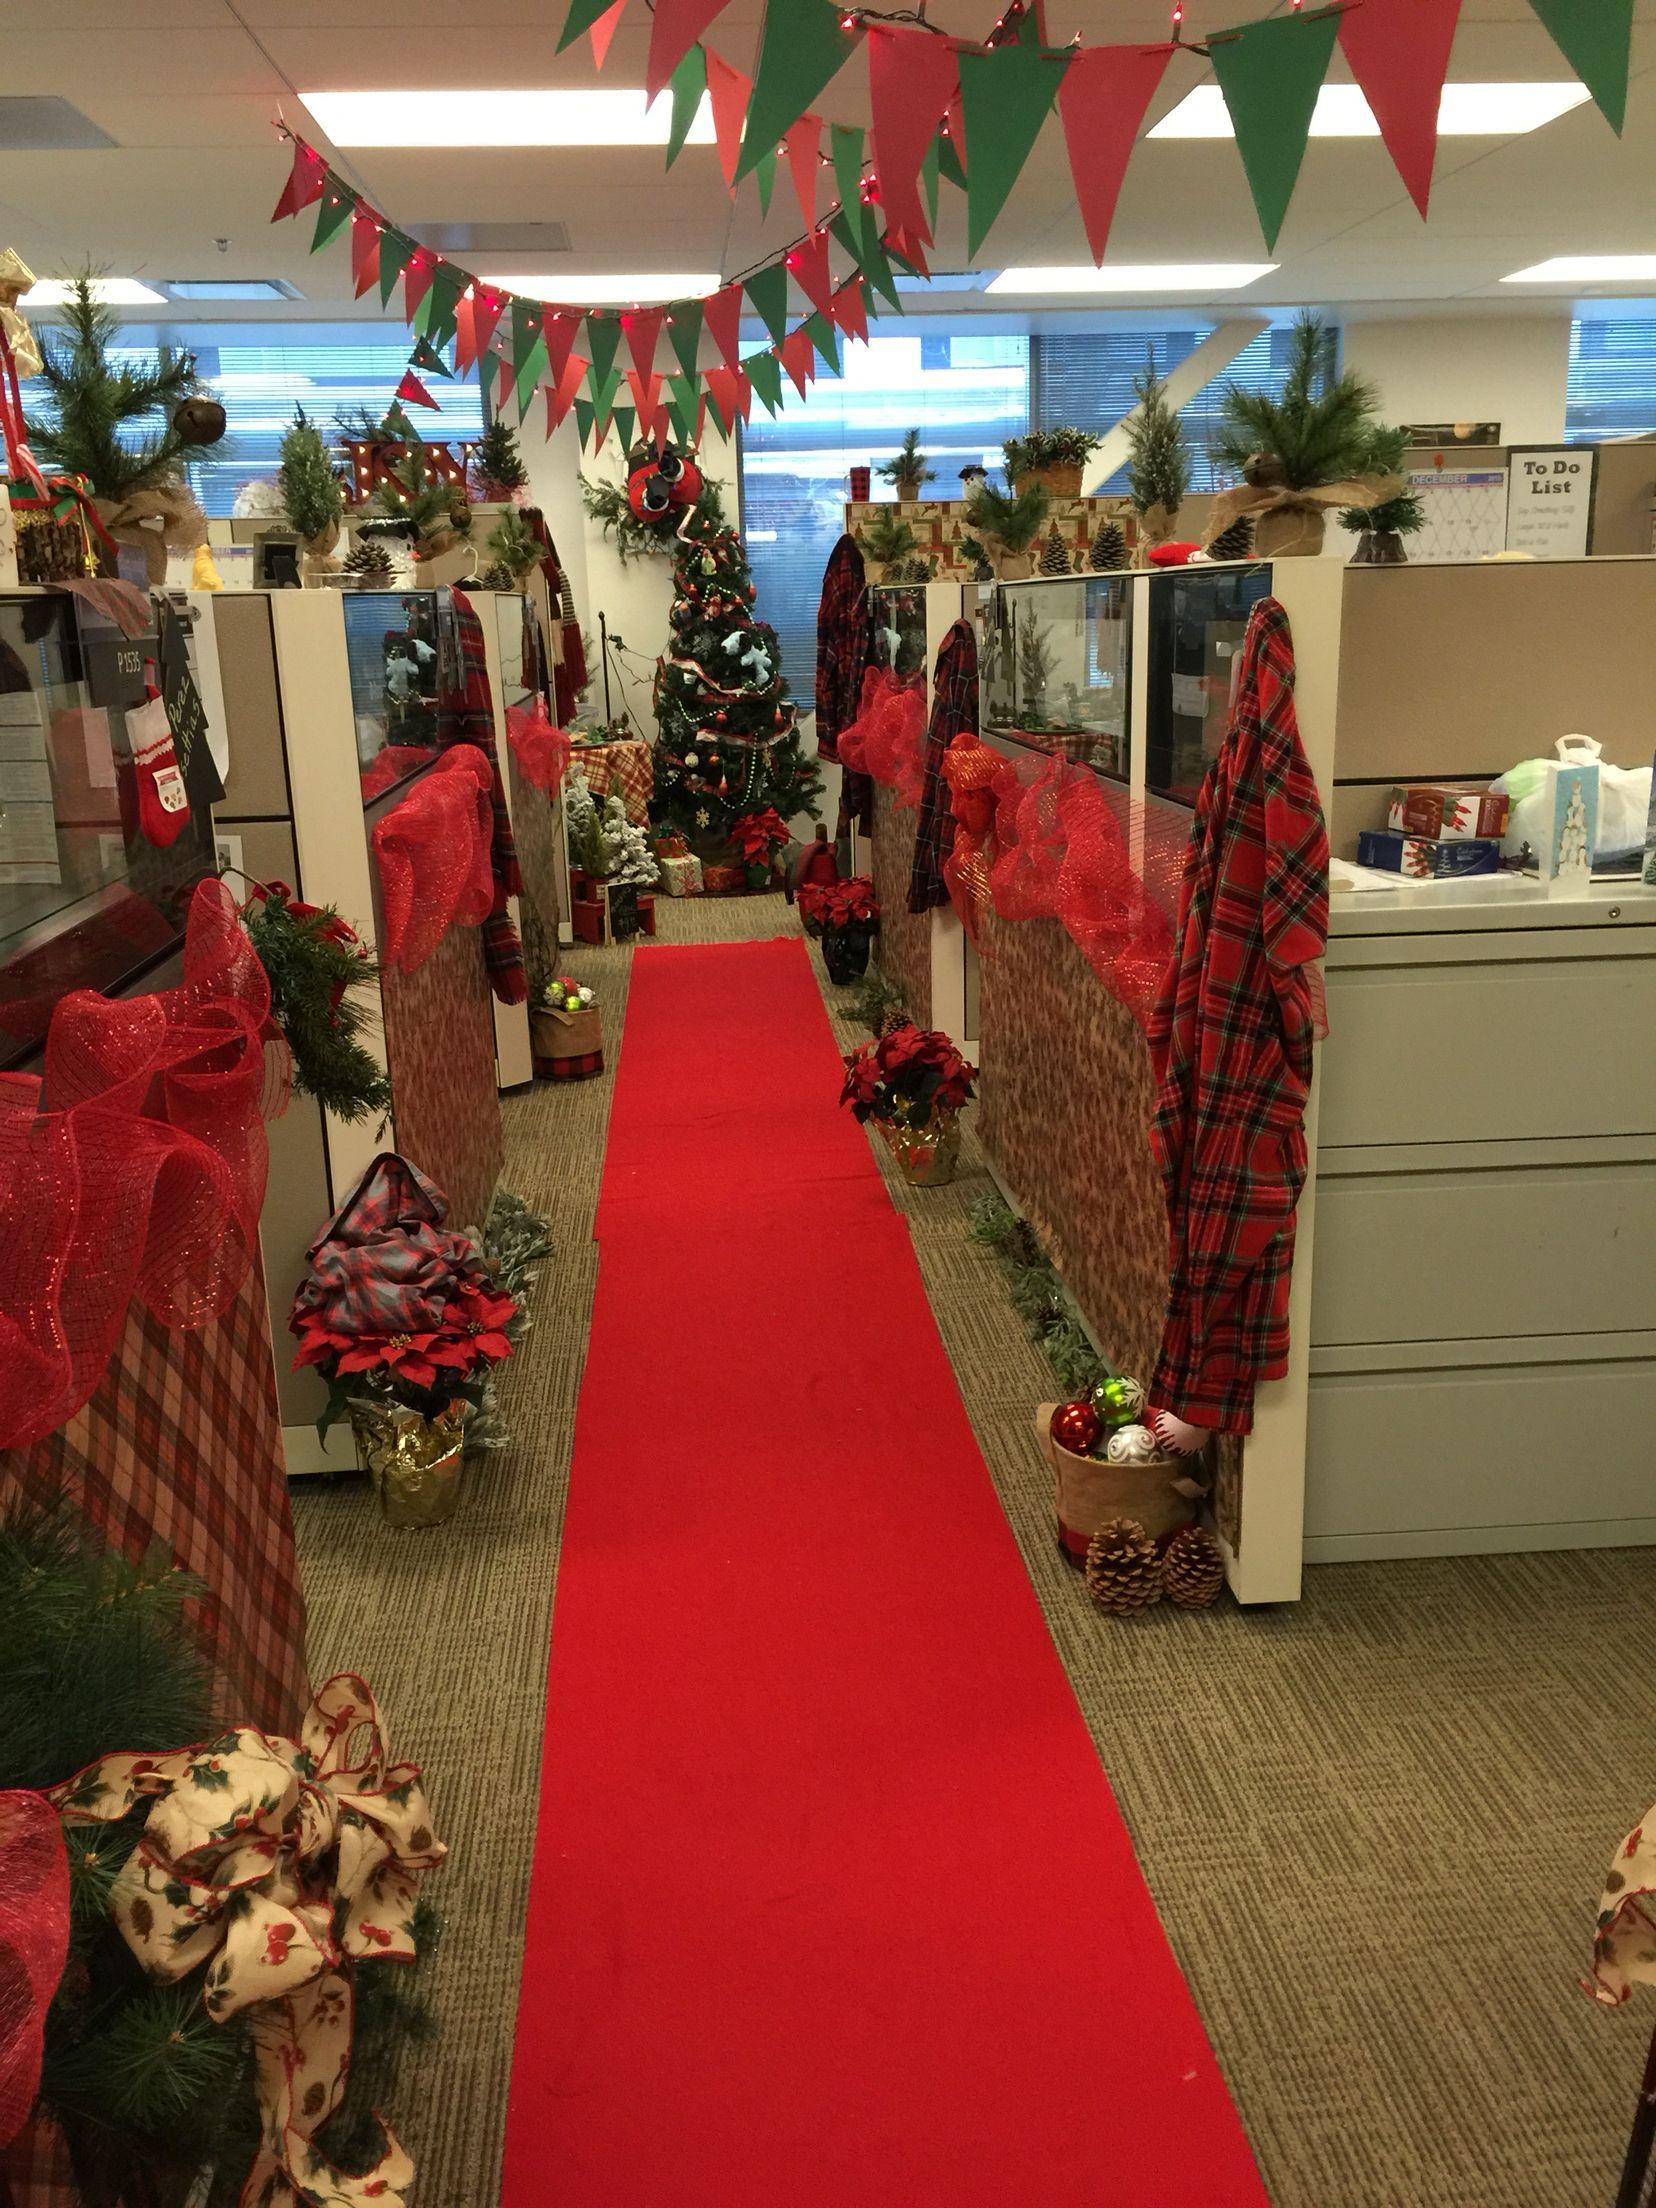 Office holiday decor 2015 adornos godin decoraci n for Decoraciones navidenas para oficinas 2016